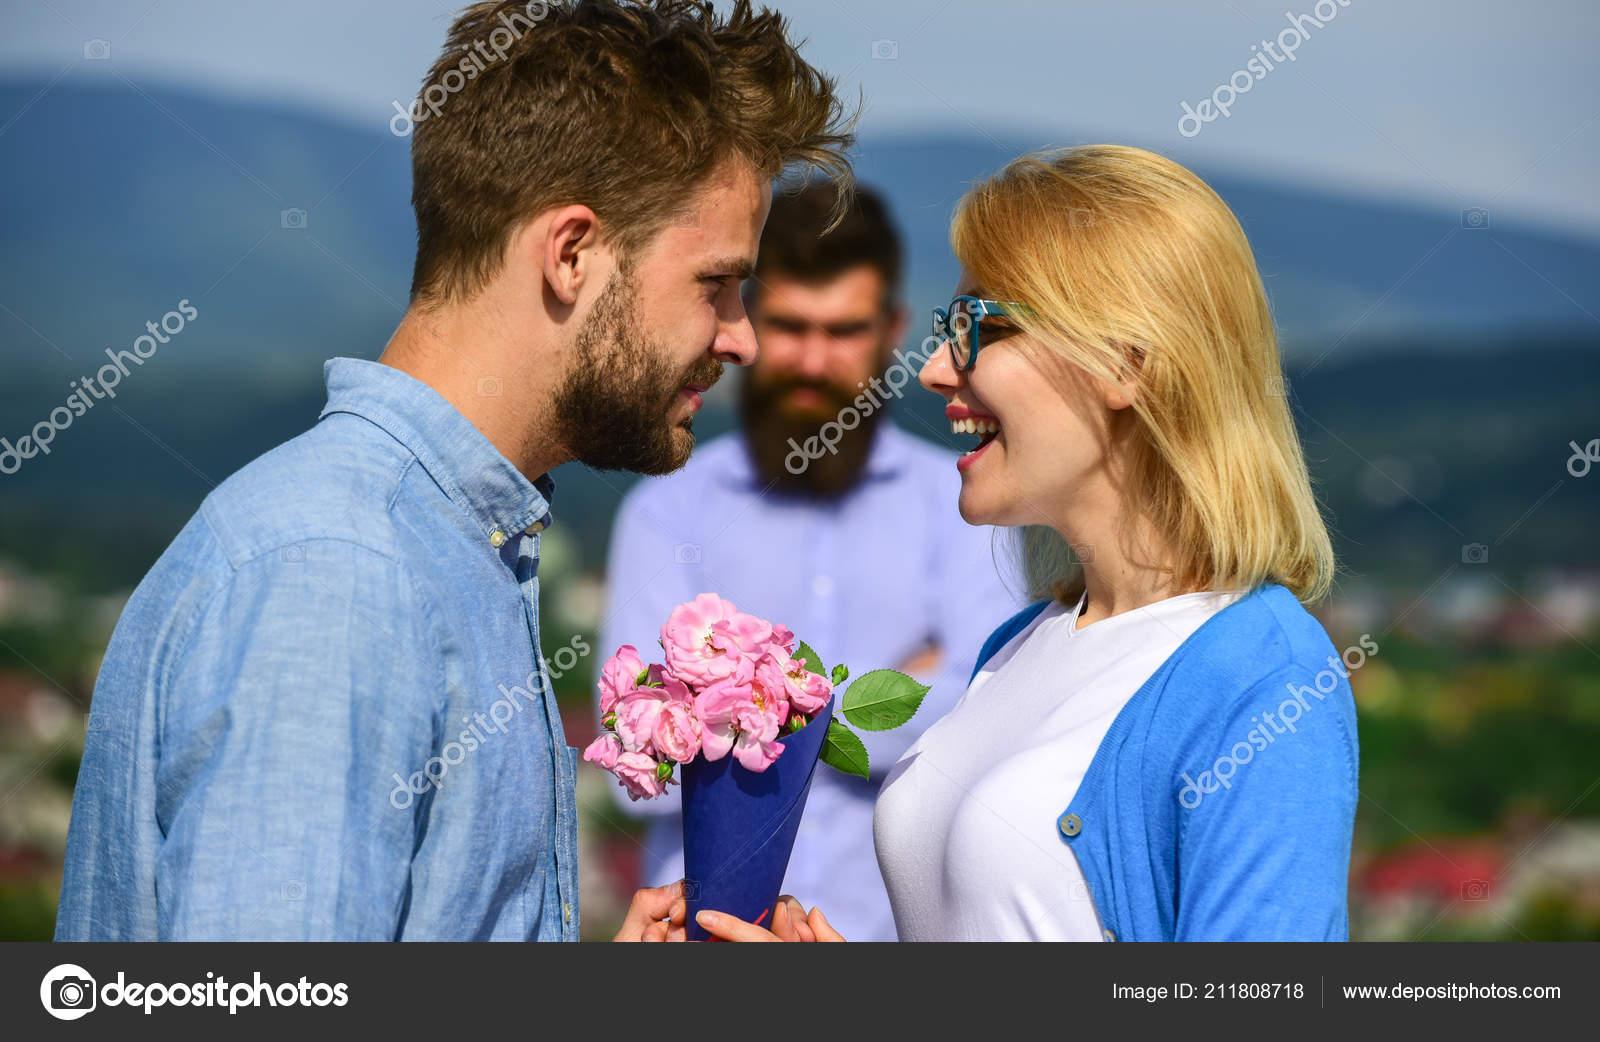 Taurus kvinna & Libra Man Kärlek, Äktenskap & sexuell kompatibilitet.